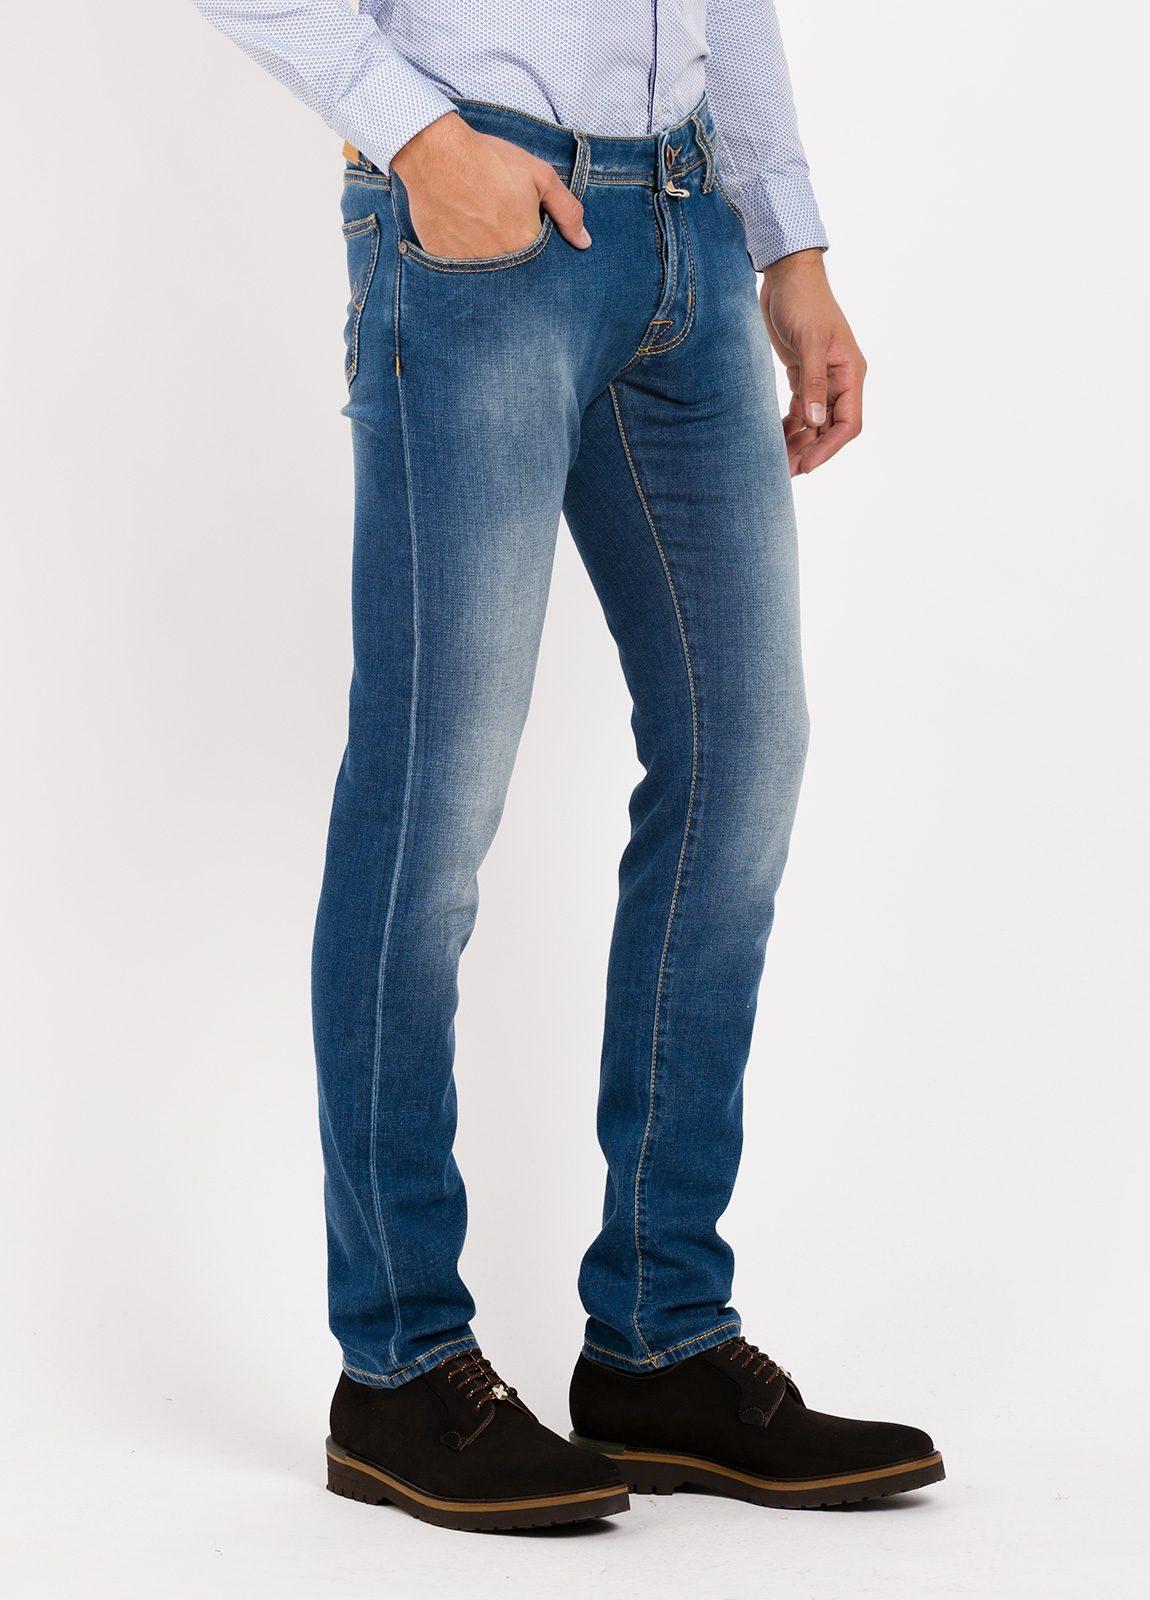 Pantalón 5 bolsillos ligeramente slim fit modelo J622 color azul denim . 95% Algodón, 3% poliestes 2% Ea. - Ítem1